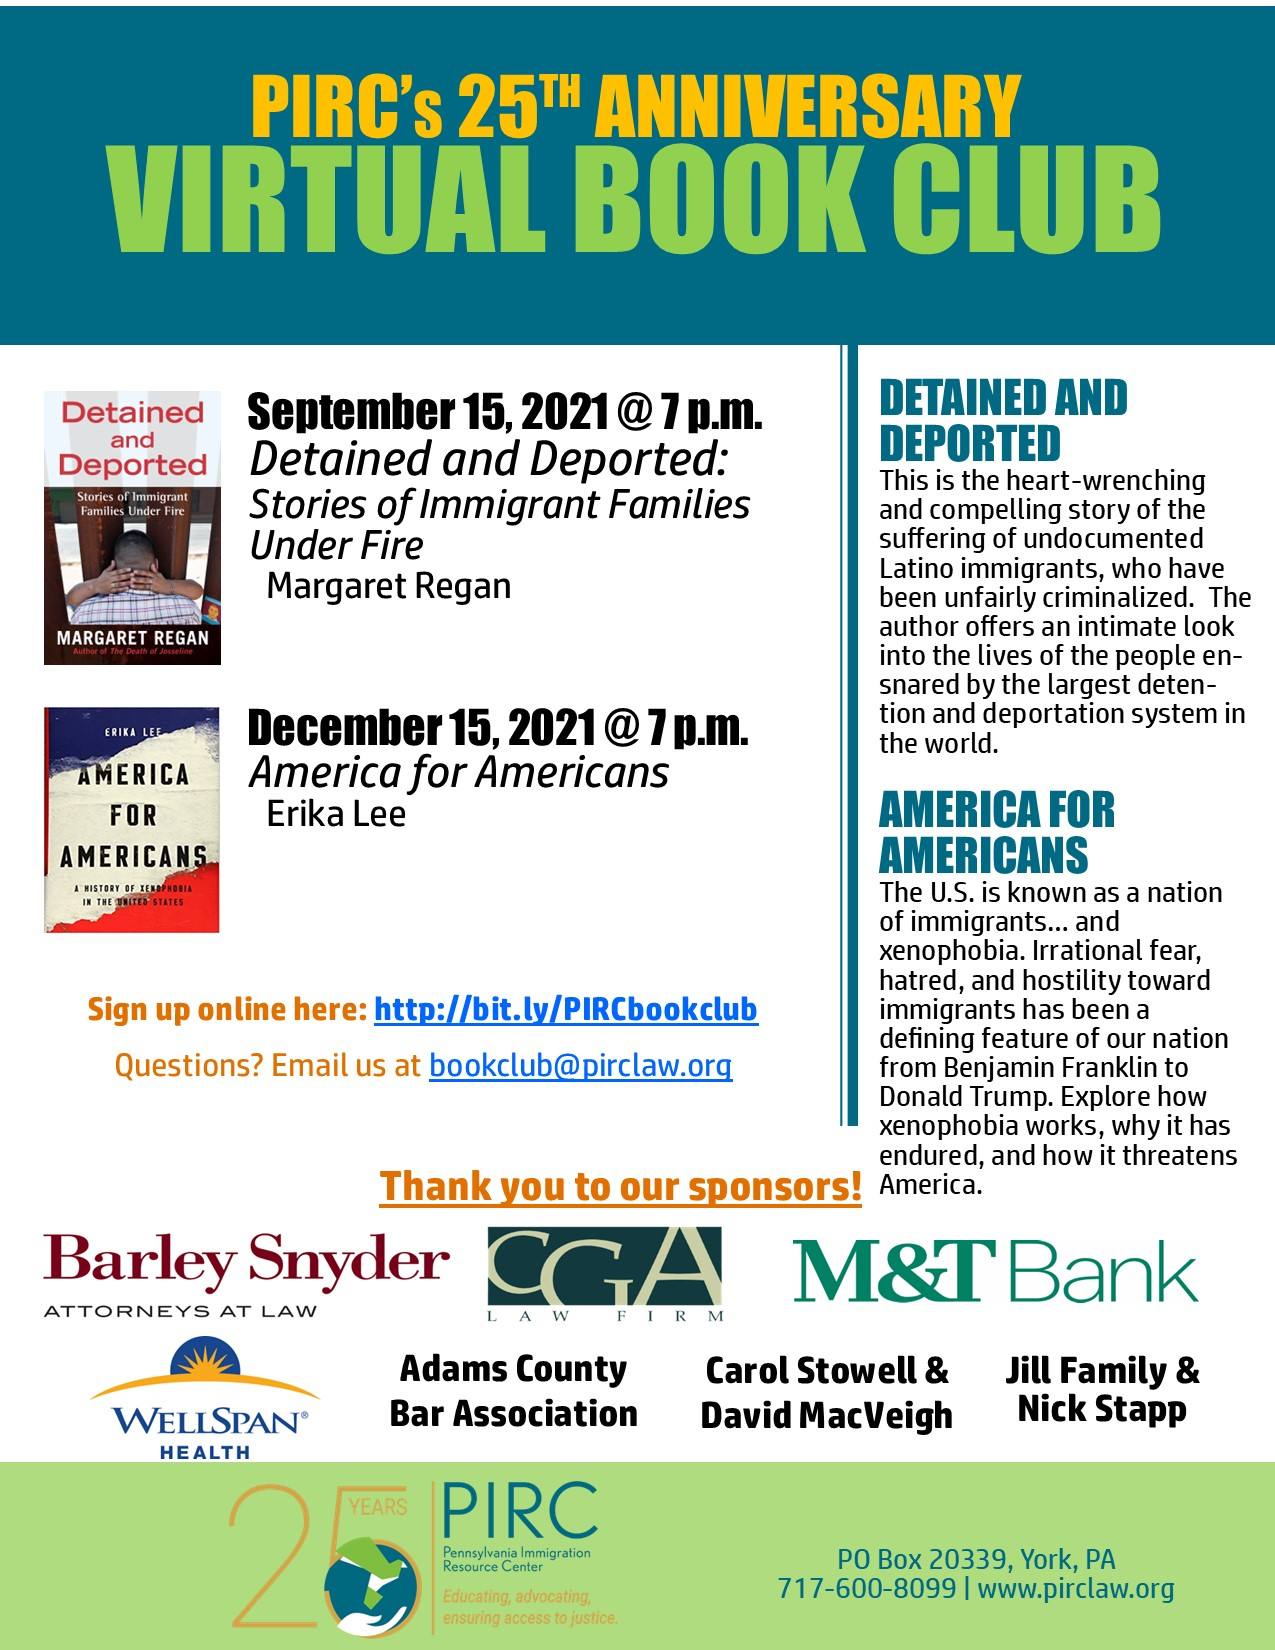 PIRC 25th Anniversary Book Club - September and December Books